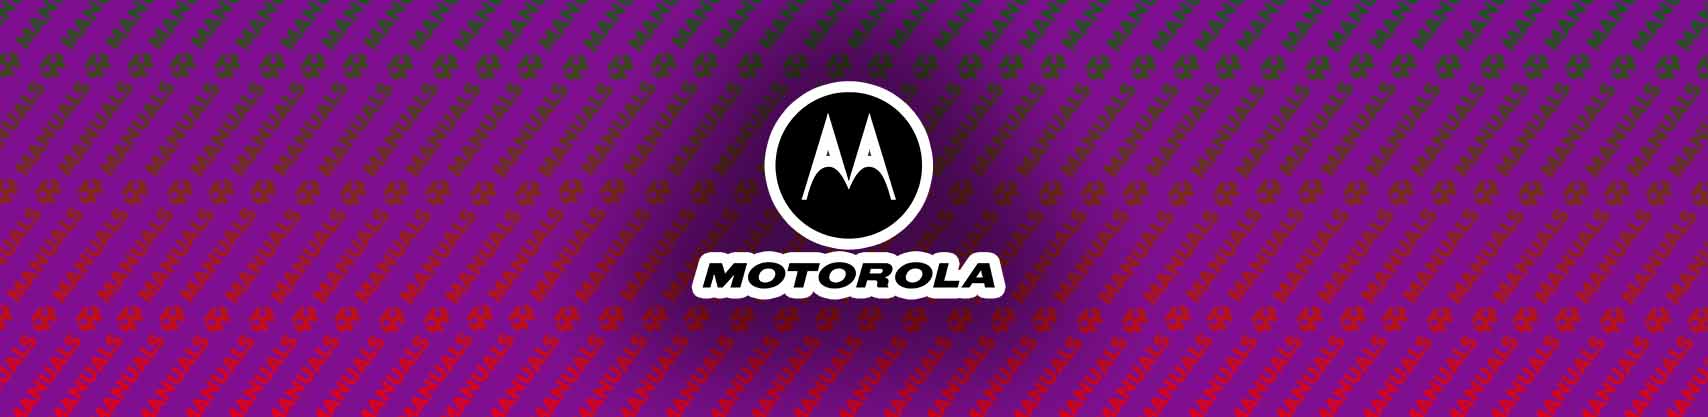 Motorola G6 Manual